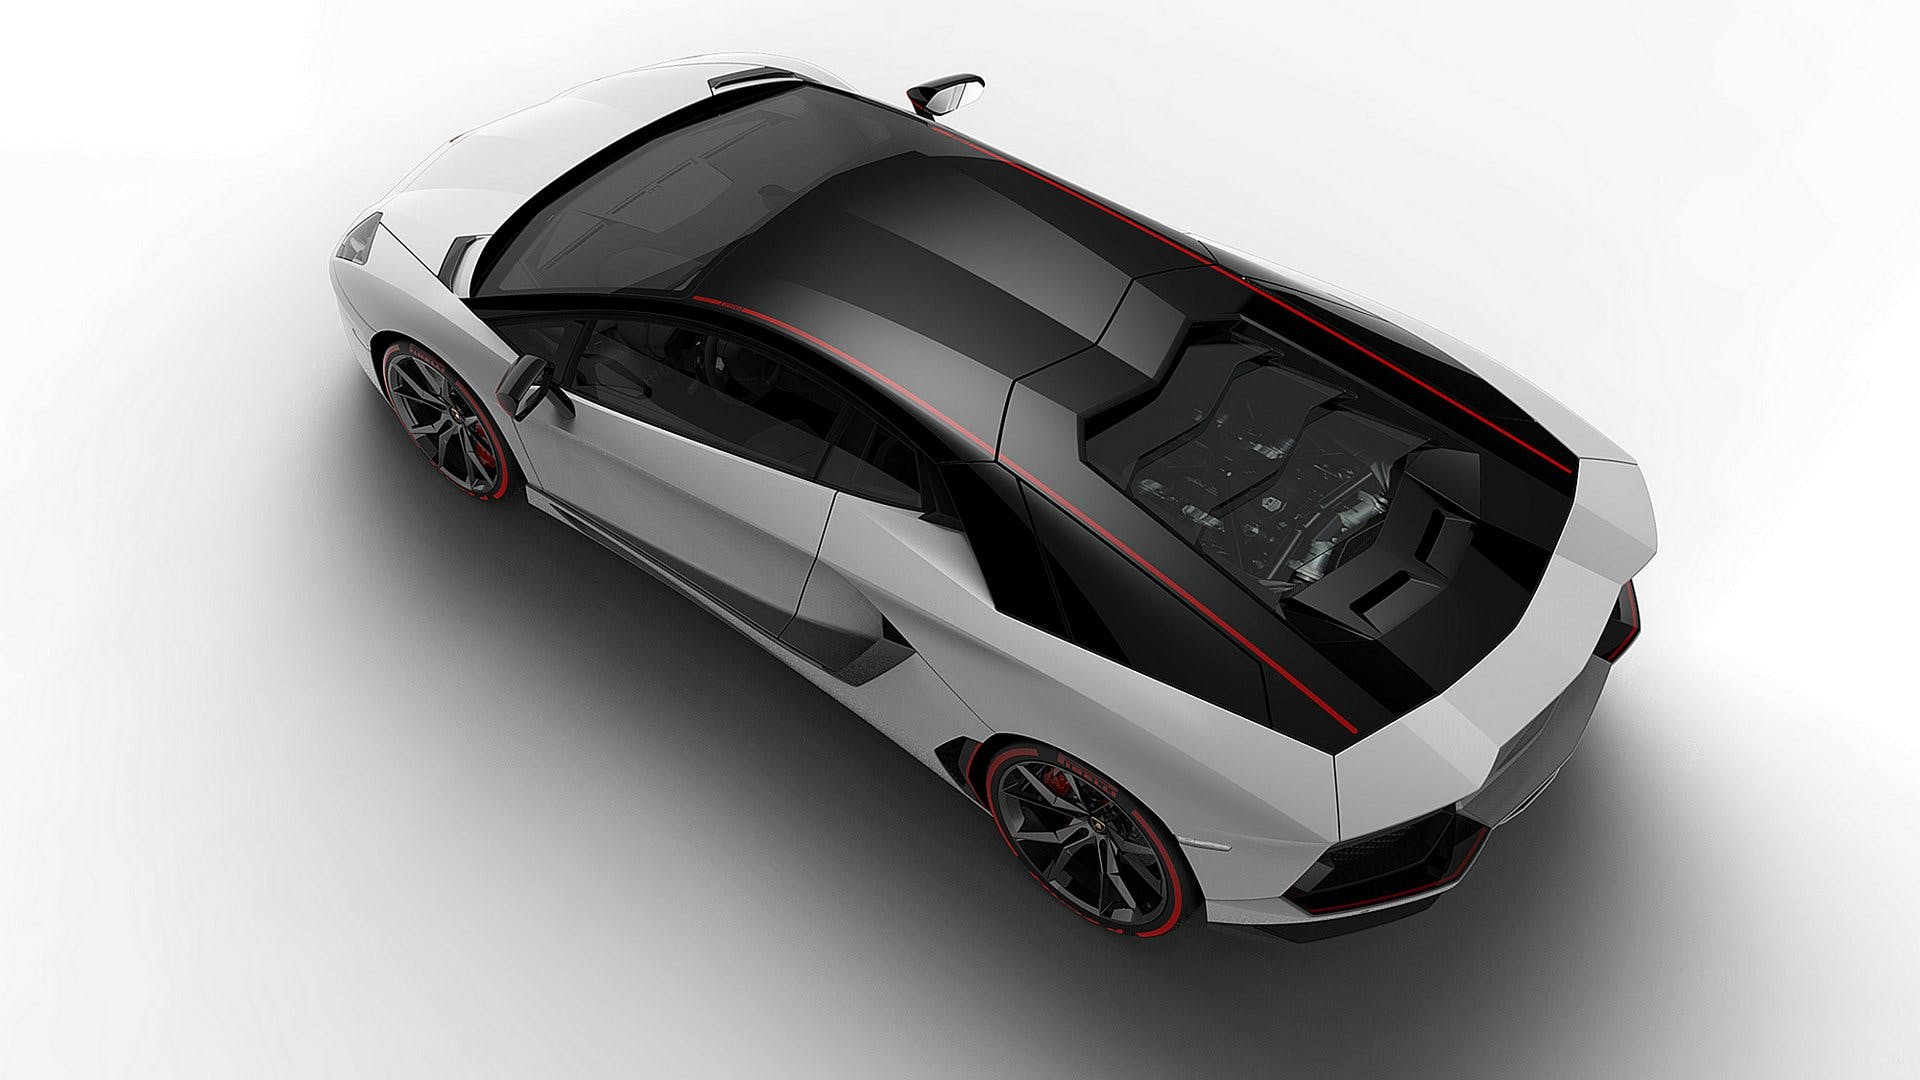 LamborghiniAventadorPirelliEdition-004